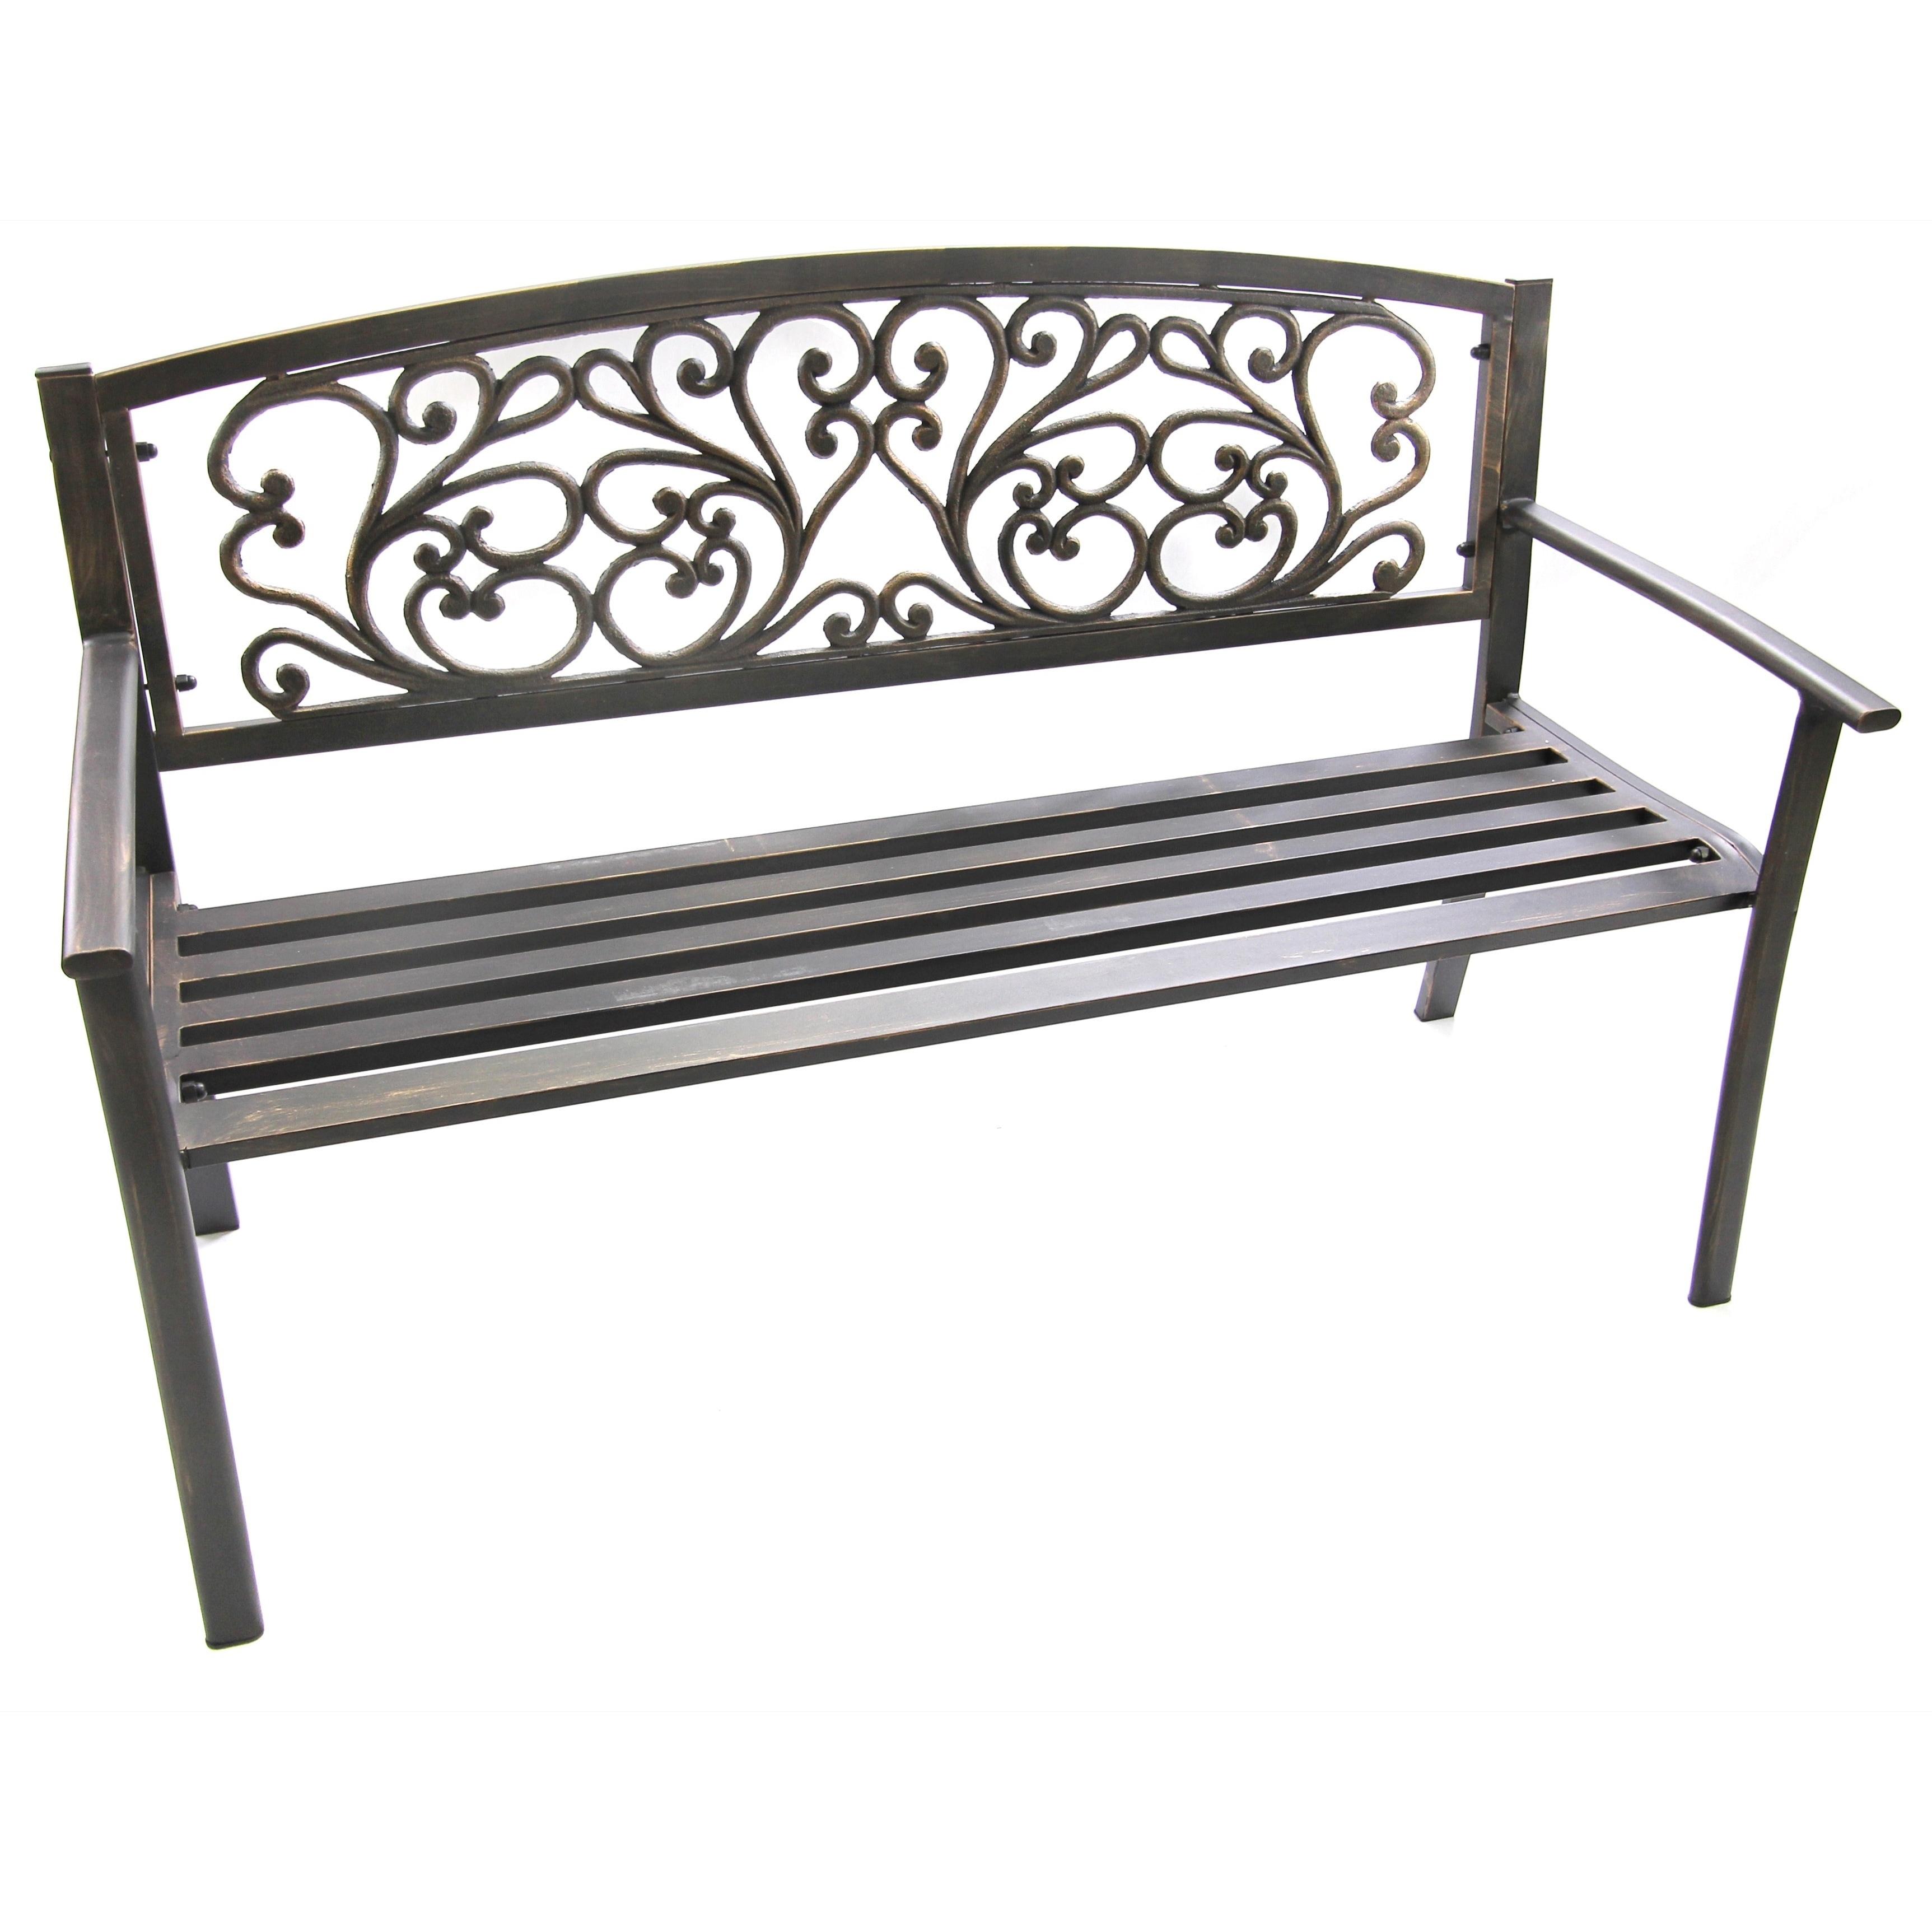 Jordan Scroll Bench (Black Scroll Bench), Patio Furniture...